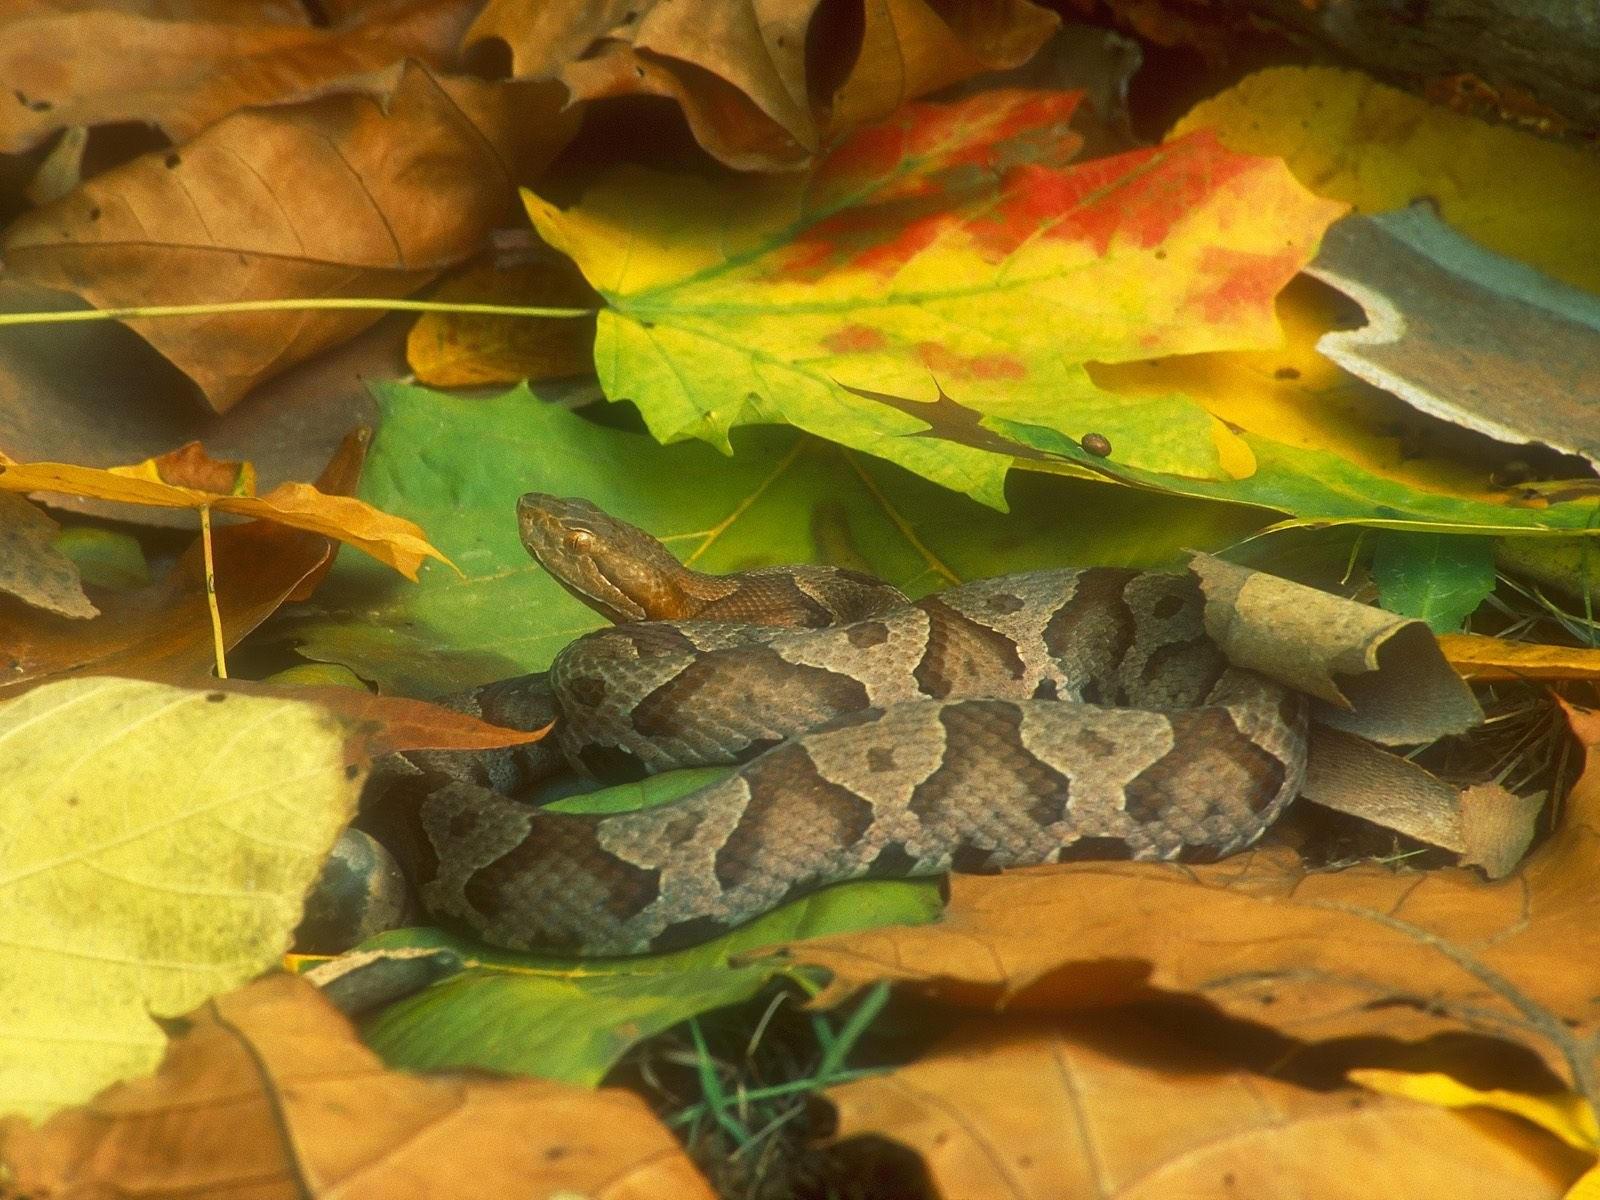 Змия в осенних листьях